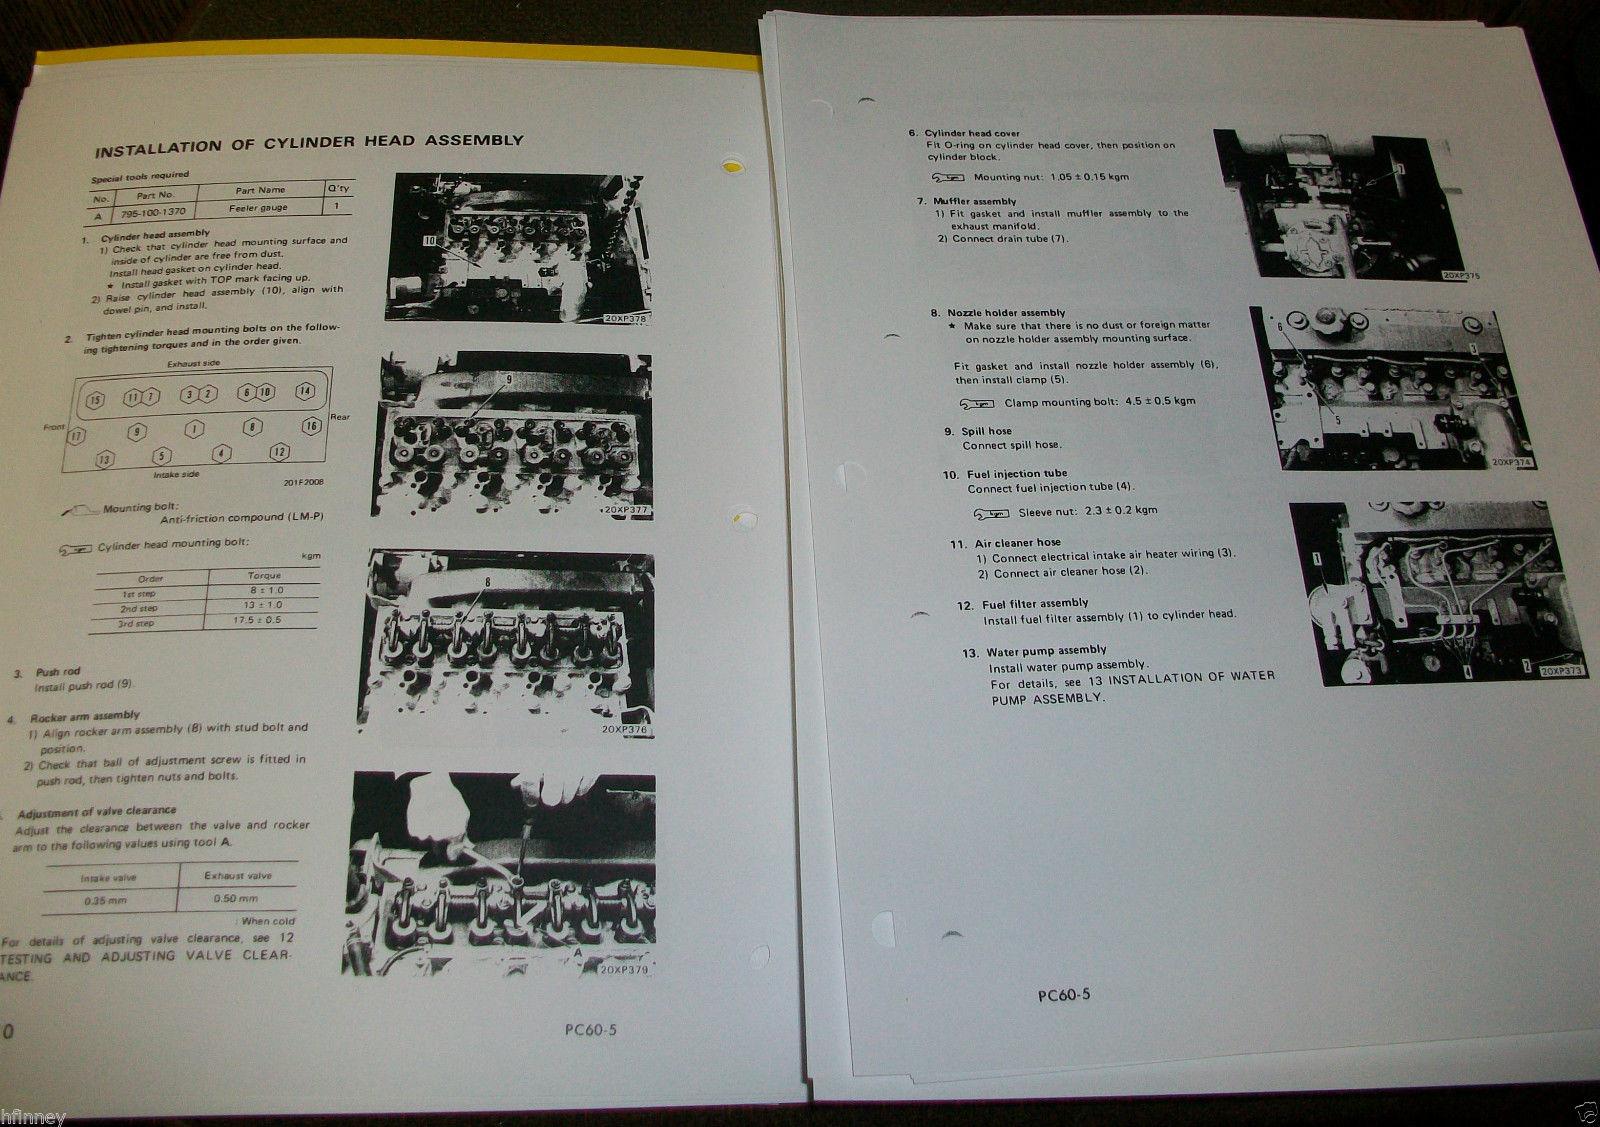 Komatsu Fg30 Forklift Wiring Diagram | Wiring Liry on taylor forklift wiring diagrams, komatsu forklift tools, komatsu forklift dimensions, toyota electric forklift wiring diagrams, yale forklift wiring diagrams, clark forklift wiring diagrams, toyota repair diagrams, komatsu forklift troubleshooting, komatsu forklift manuals, komatsu 25 forklift specifications, komatsu lift truck parts, daewoo forklift diagrams, komatsu forklift lights, komatsu forklift accessories, nissan 50 forklift parts diagrams, nissan forklift wiring diagrams, komatsu excavators wiring-diagram, tcm forklift wiring diagrams, komatsu forklift transmission, komatsu labels fork lift fg35st7,